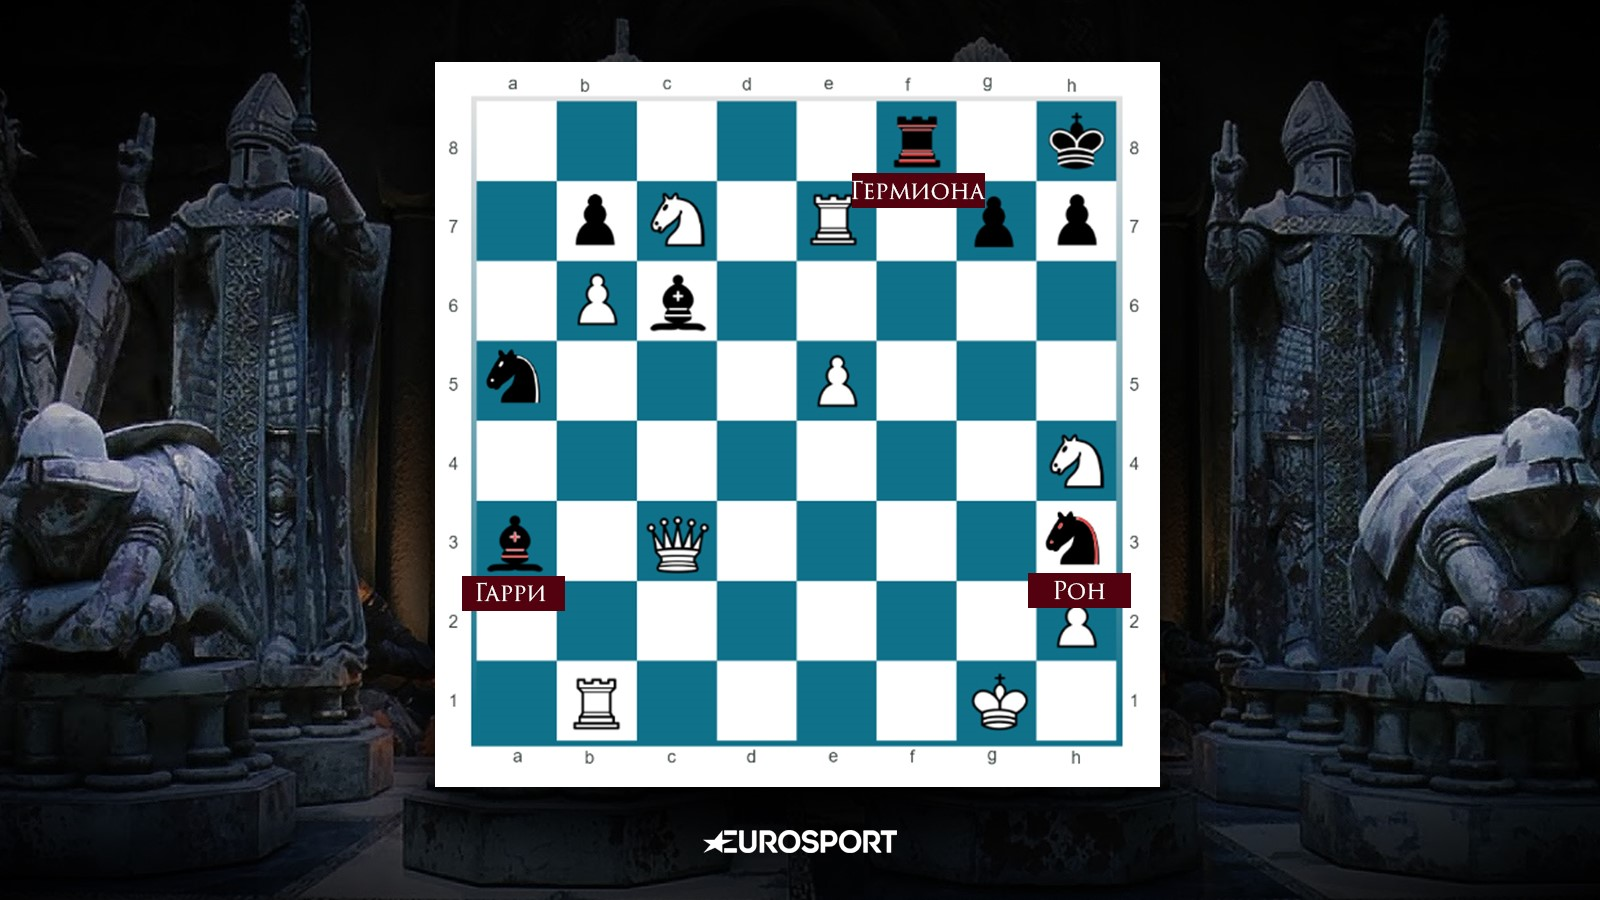 https://i.eurosport.com/2021/01/08/2967126.jpg